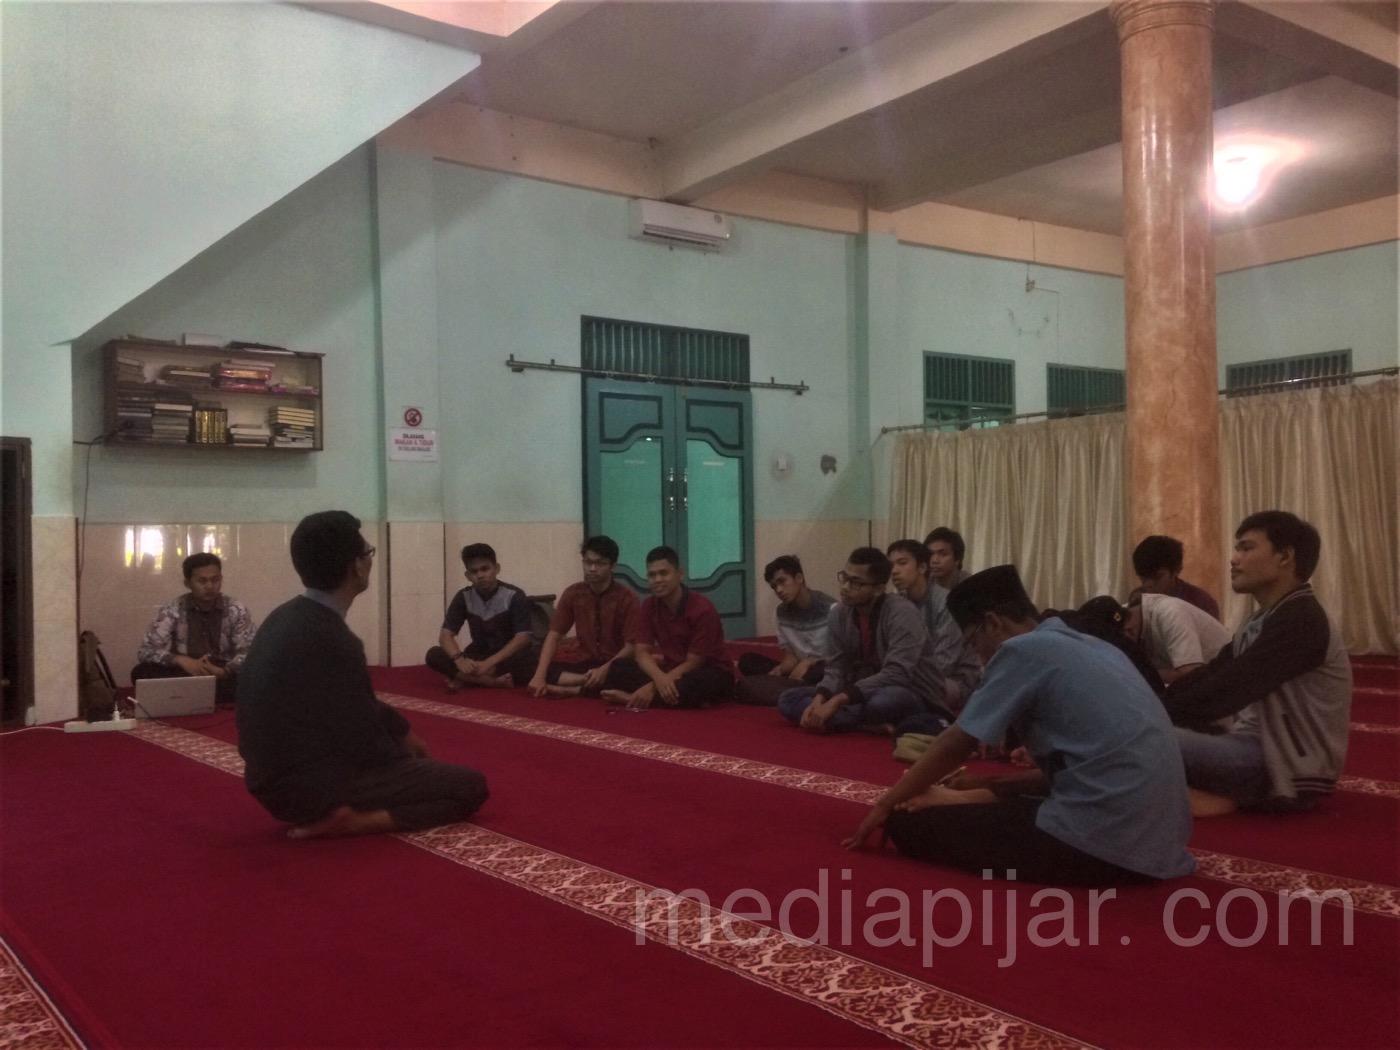 Susana diskusi pada kegiatan Quantum Hijrah Bersama Ustadz Bejo Slamet di Mesjid Asy-Asyifa, Fakultas Farmasi USU (20/5). (Fotografer: Azka Fikri)